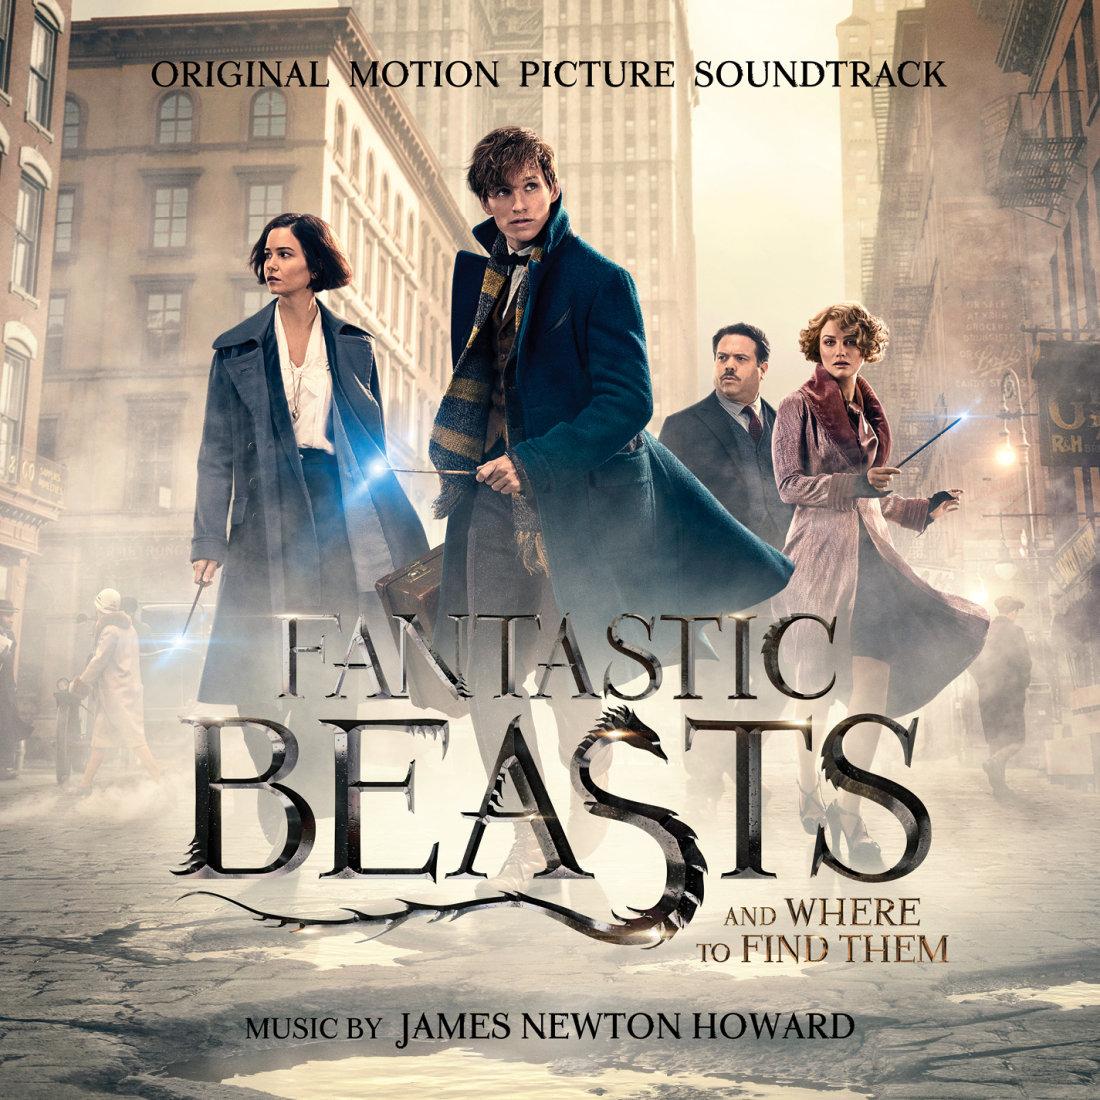 Fantastic_Beasts_Standard_Sdtk_Cover_01_1425px_RGB-1.jpg